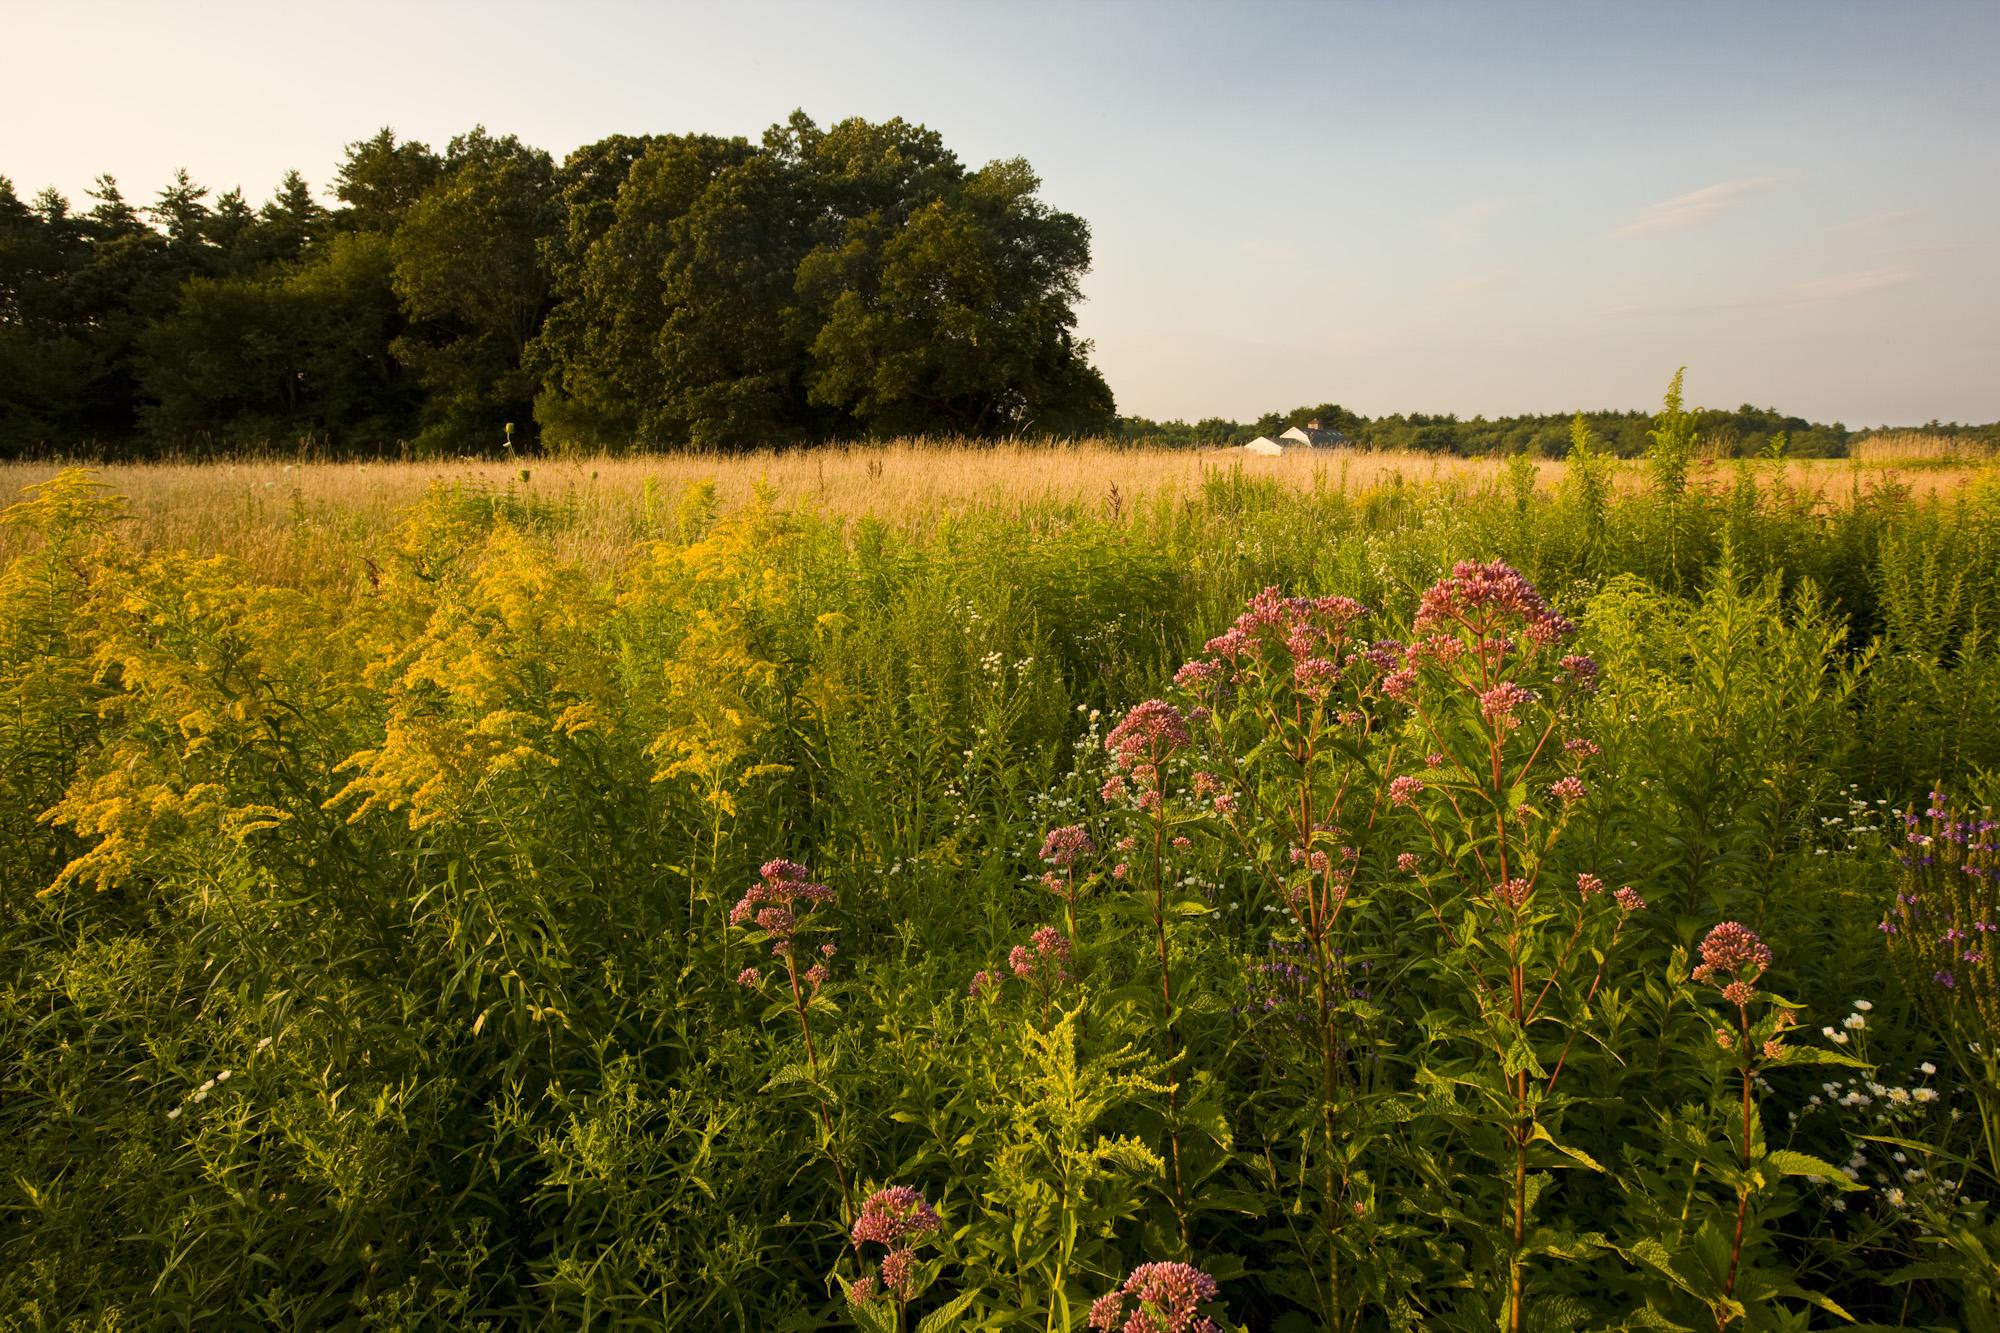 Joe-pye weed, Eutrochium purpureum, grows at Great River Preserve in Bridgewater.